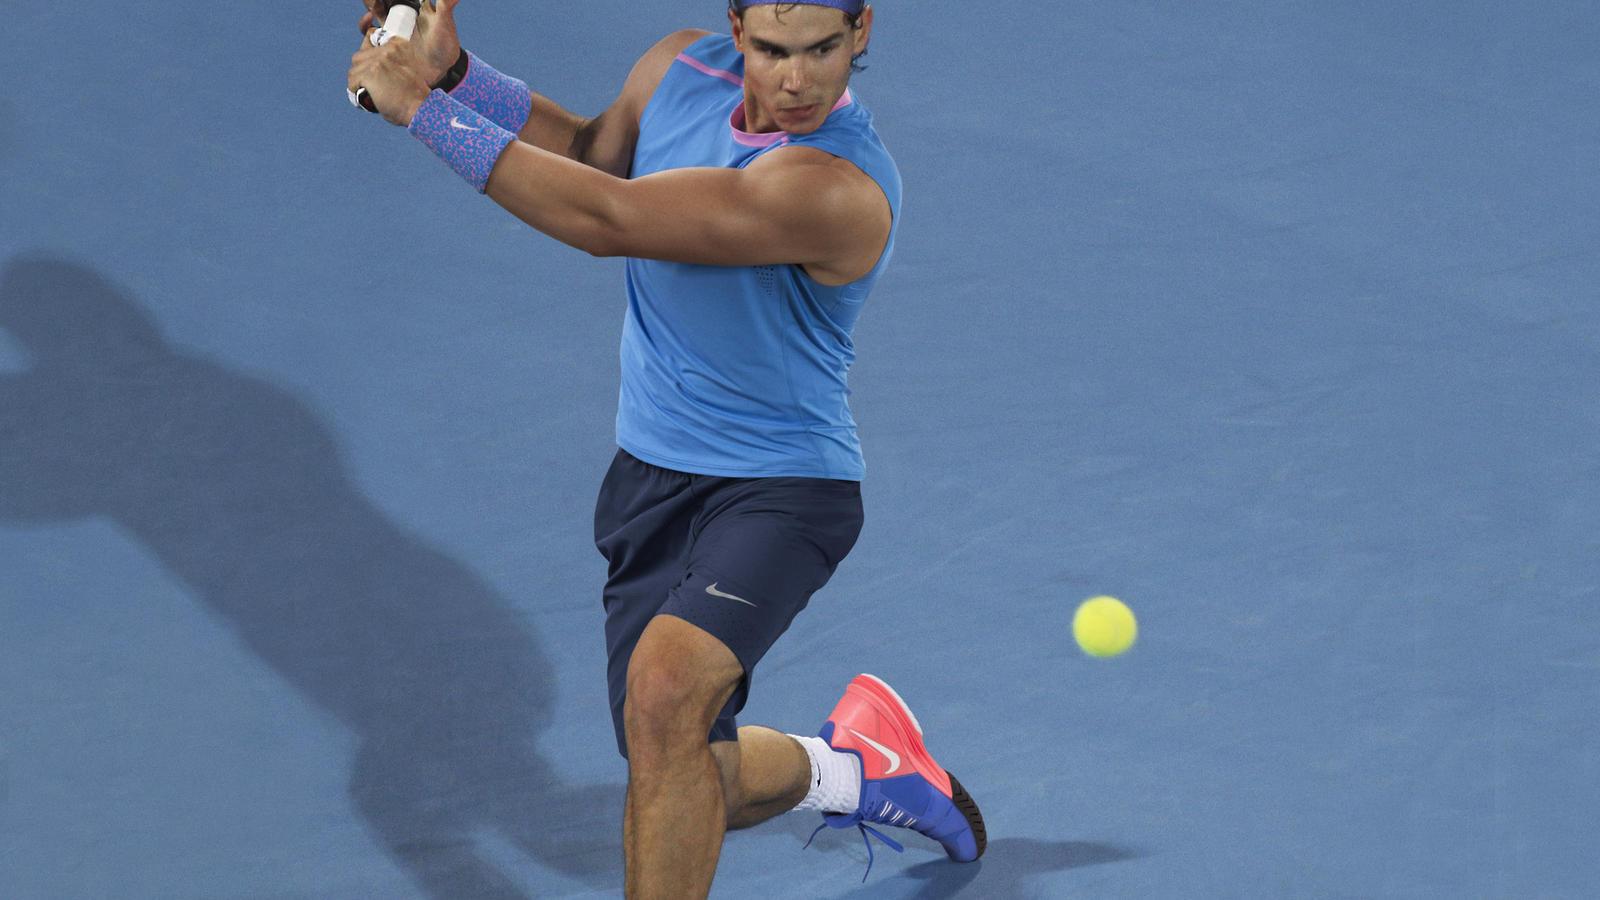 Rafa Nadal Nike Tennis Look - New York 2014